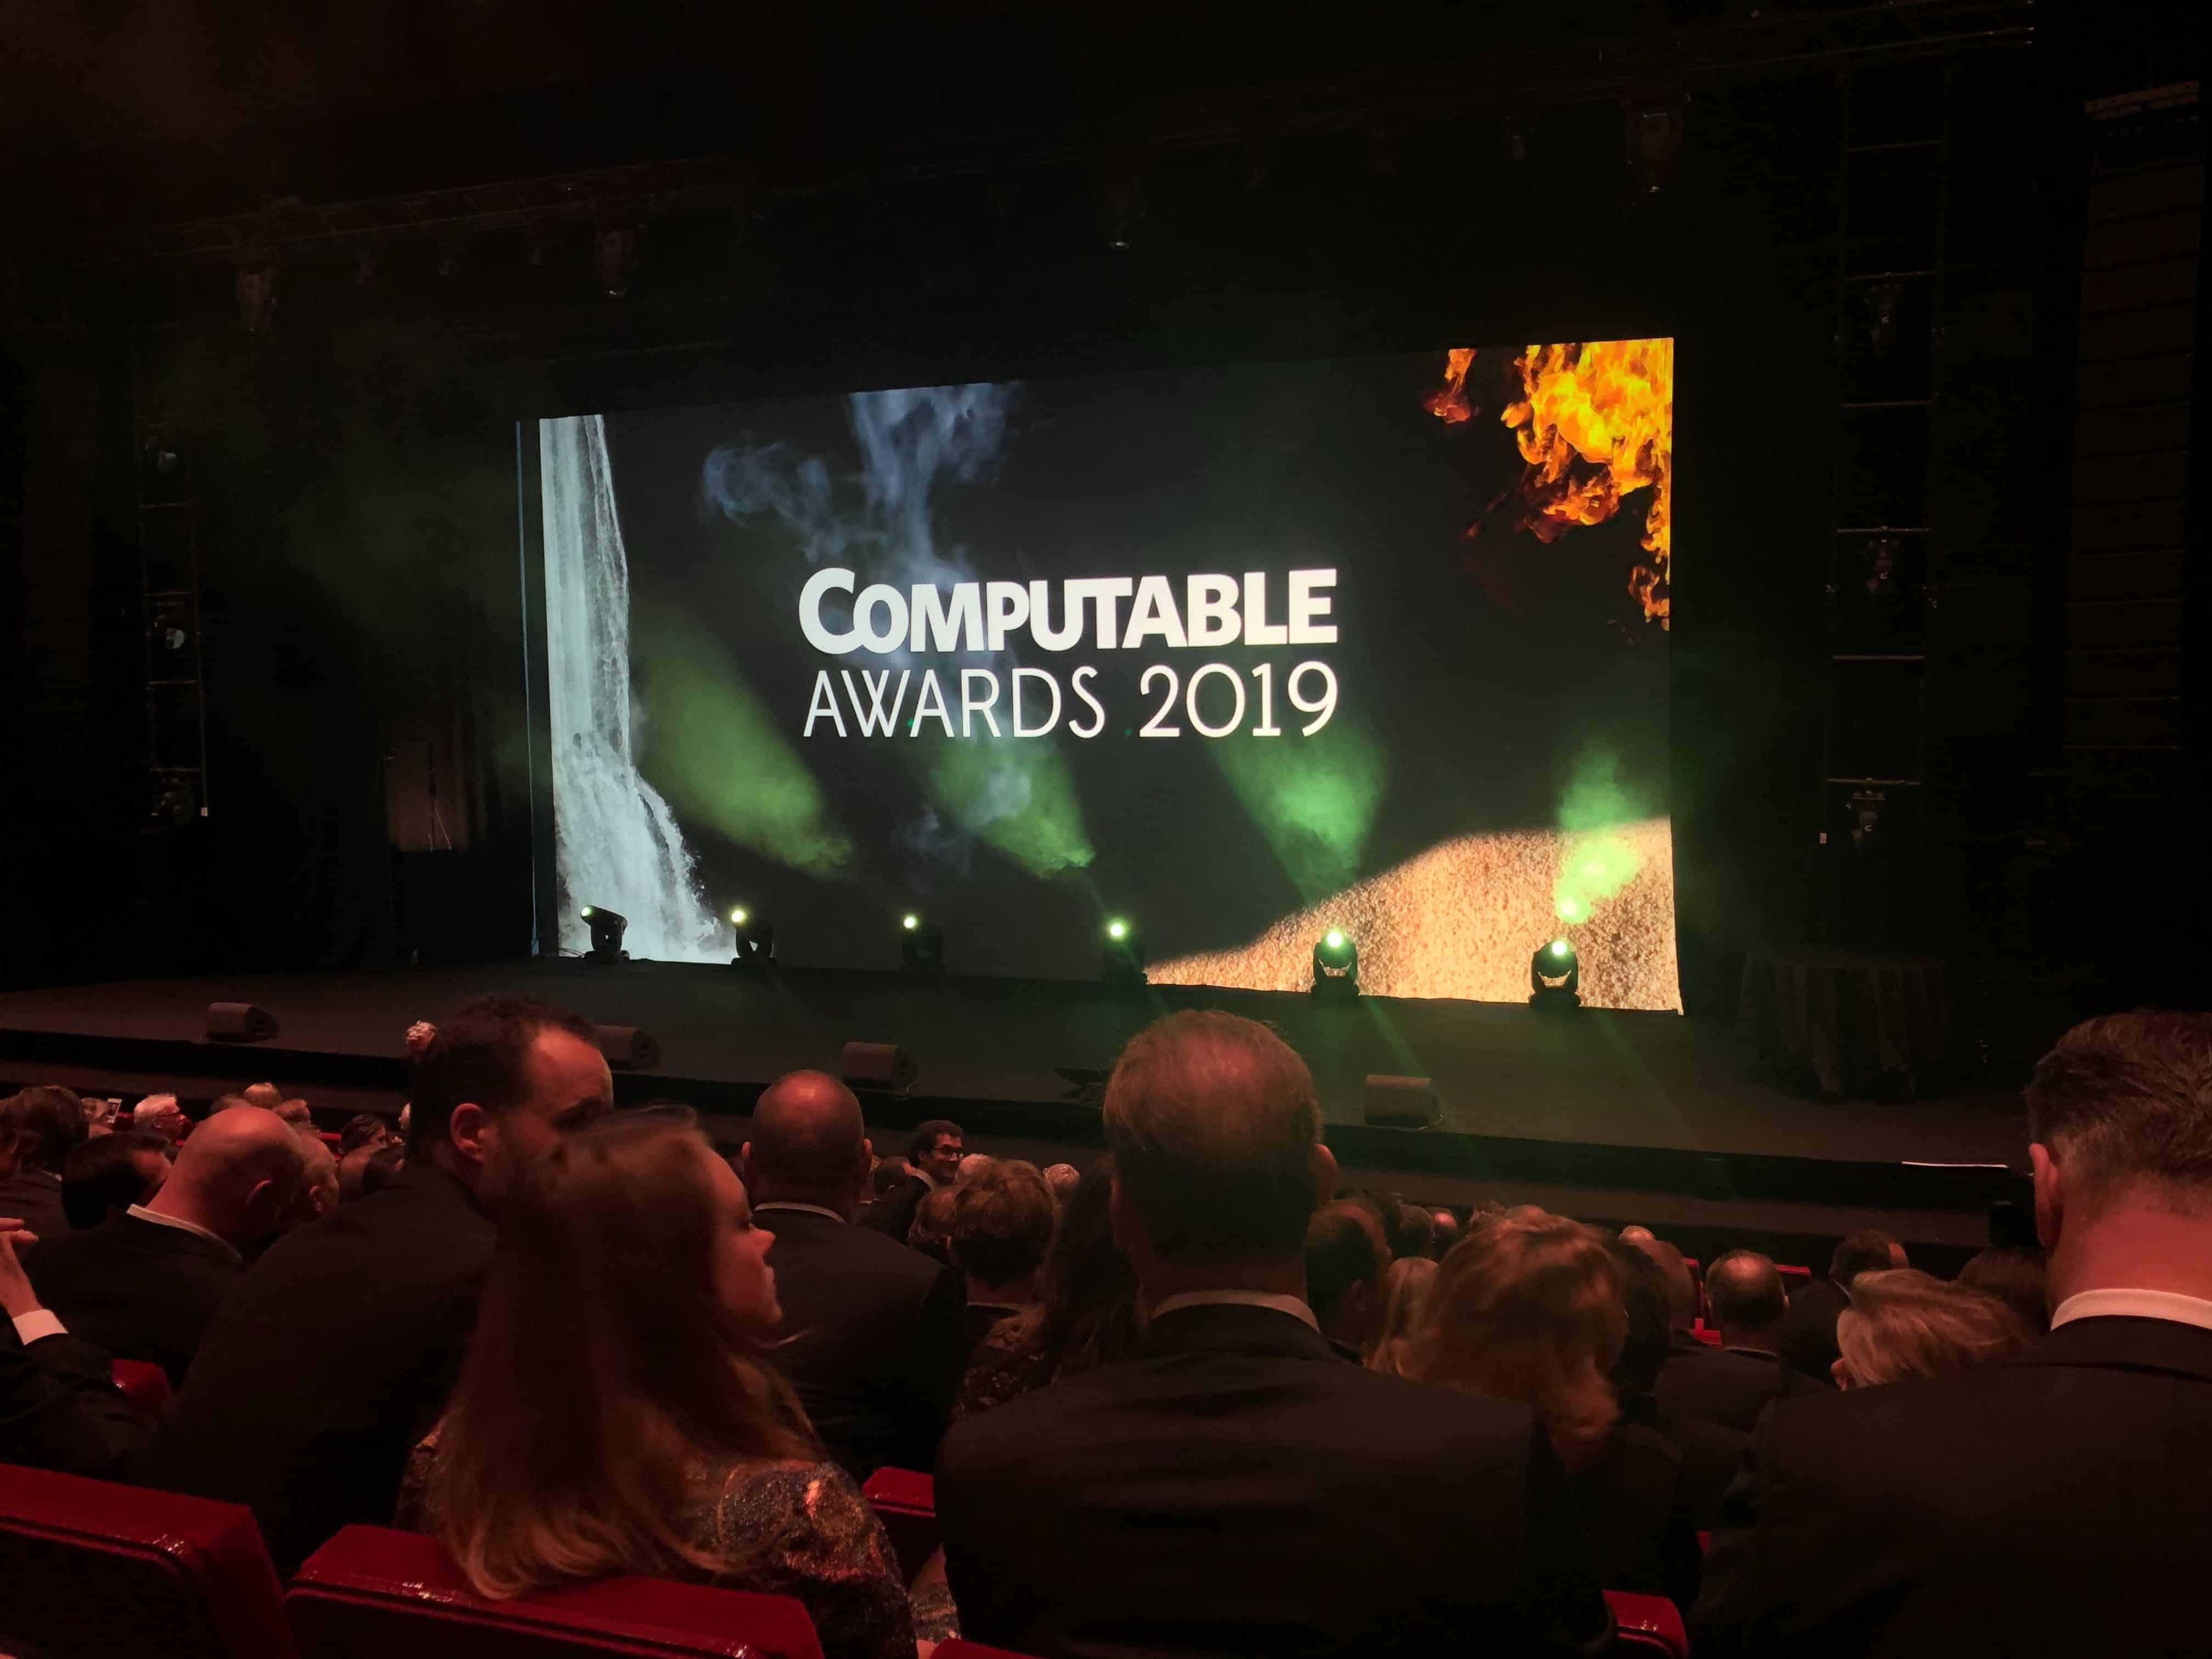 Computable Awards 2019